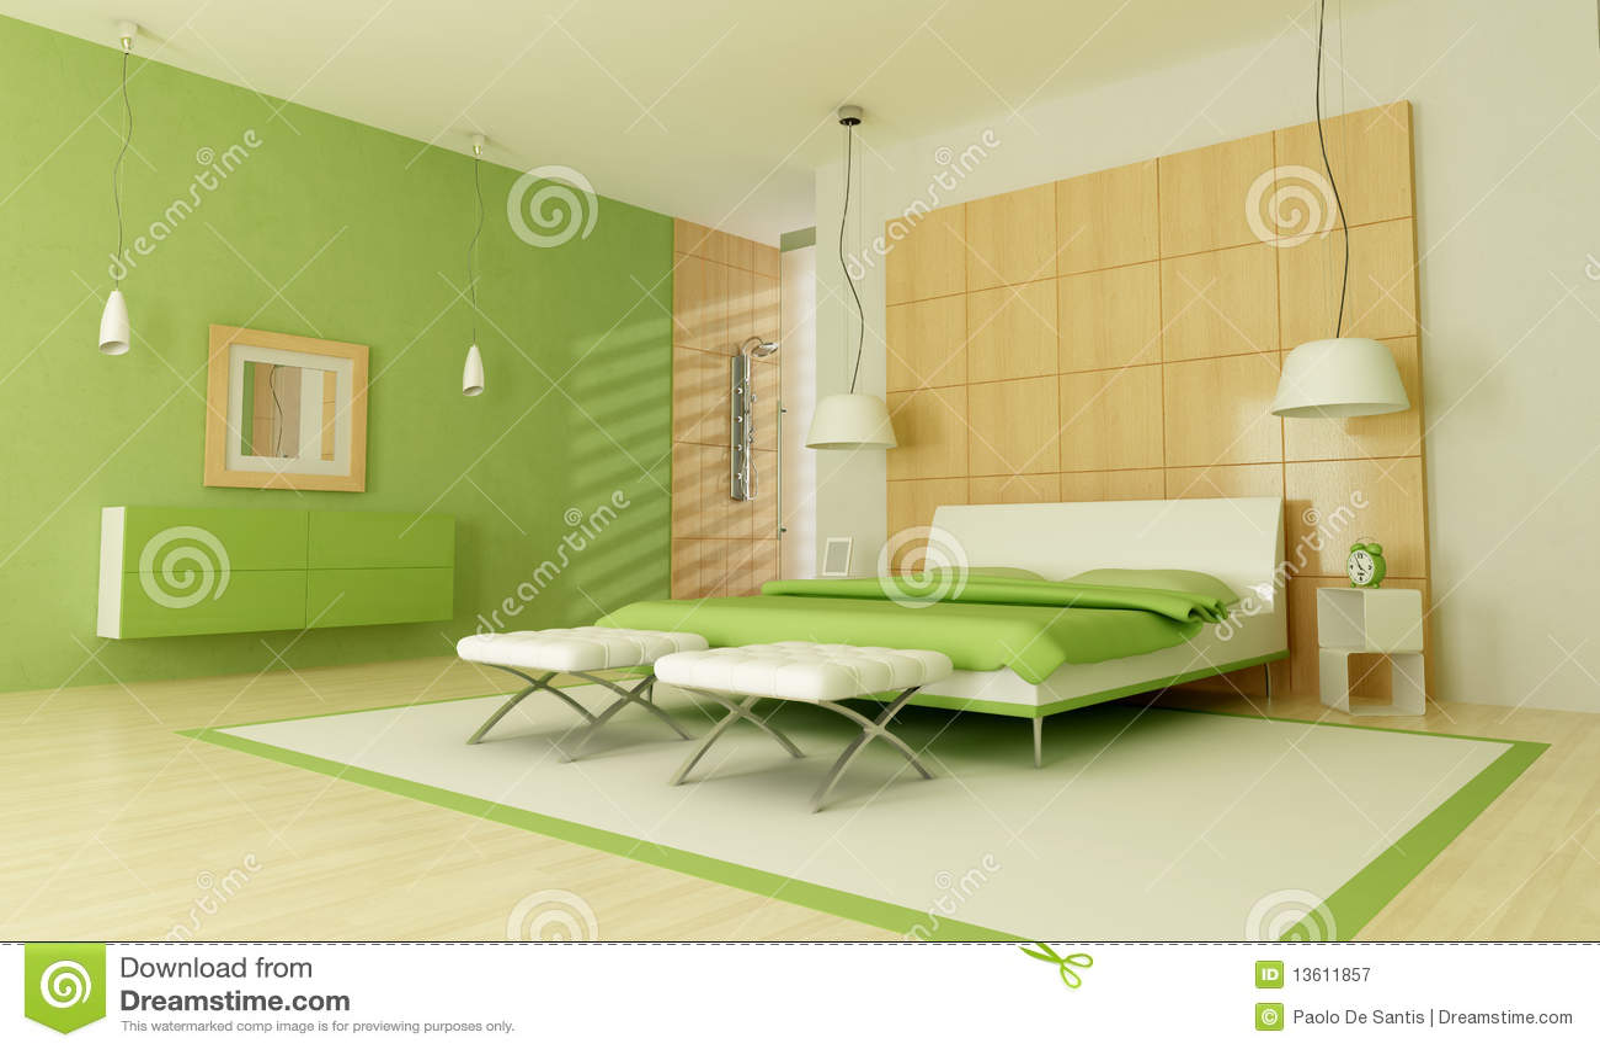 Chambre coucher moderne verte photographie stock libre for Chambre libre